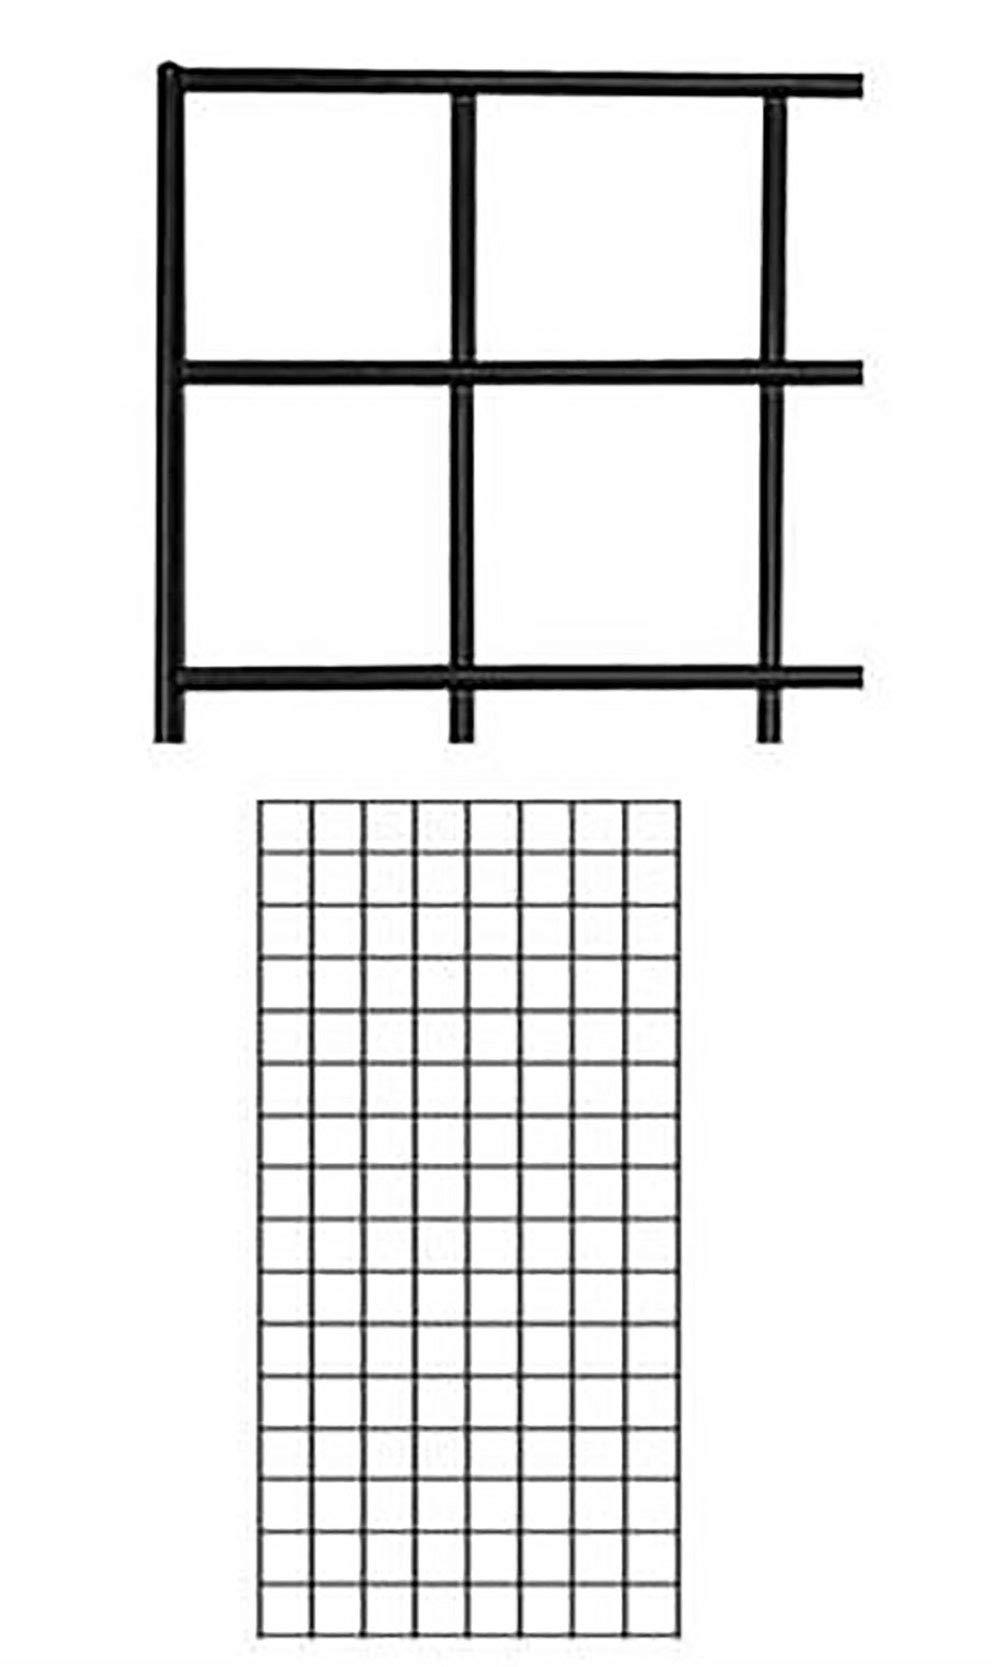 2' X 4' Wire Grid Panel - Black